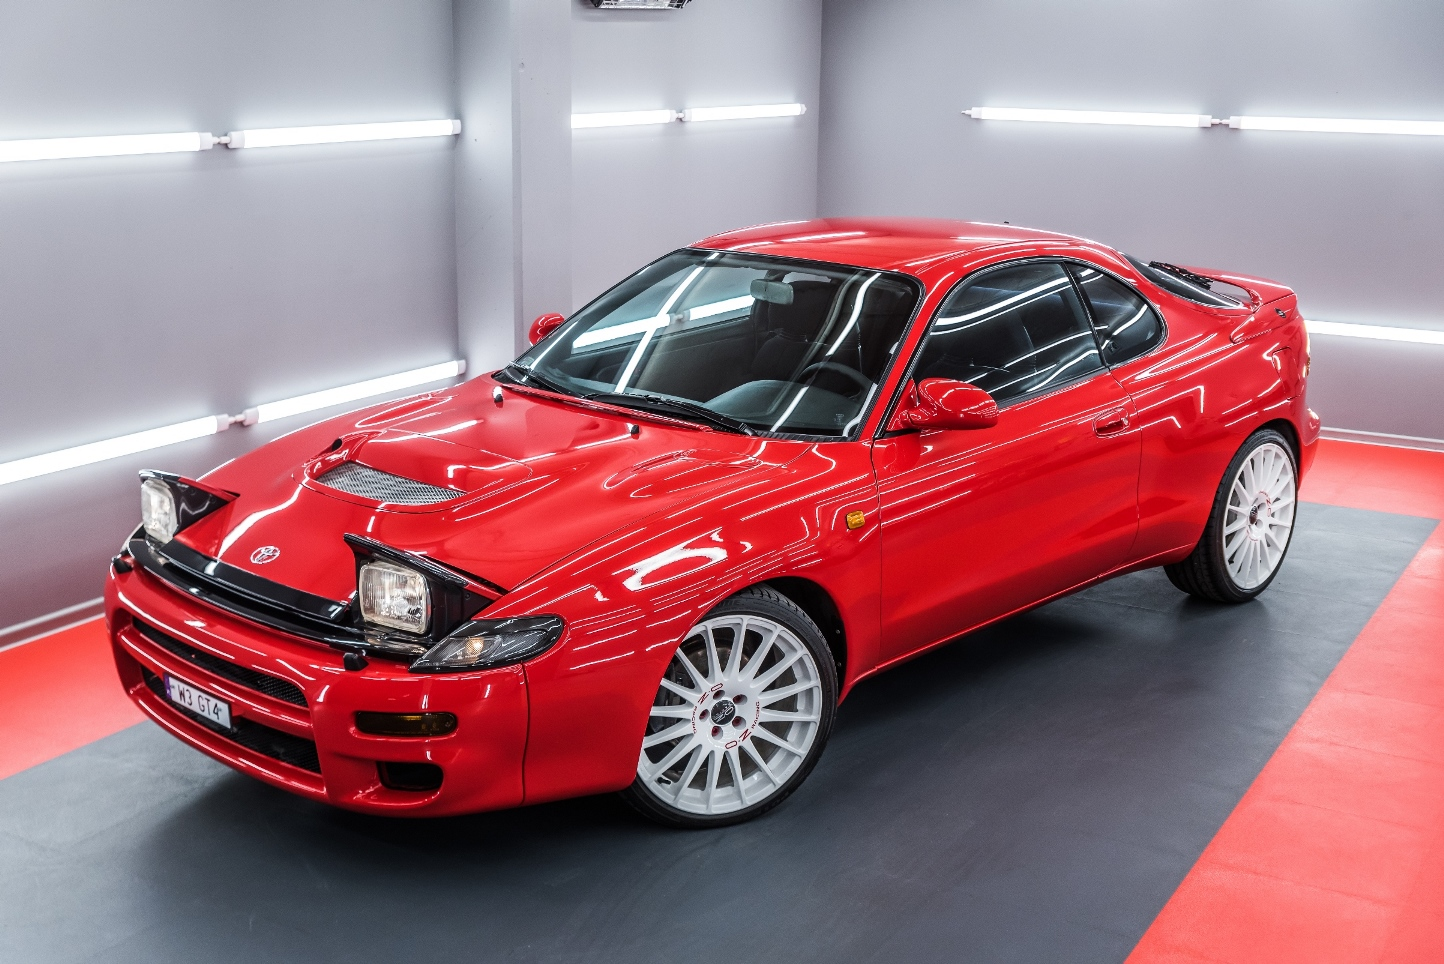 Toyota Celica ST185 Carlos Sainz